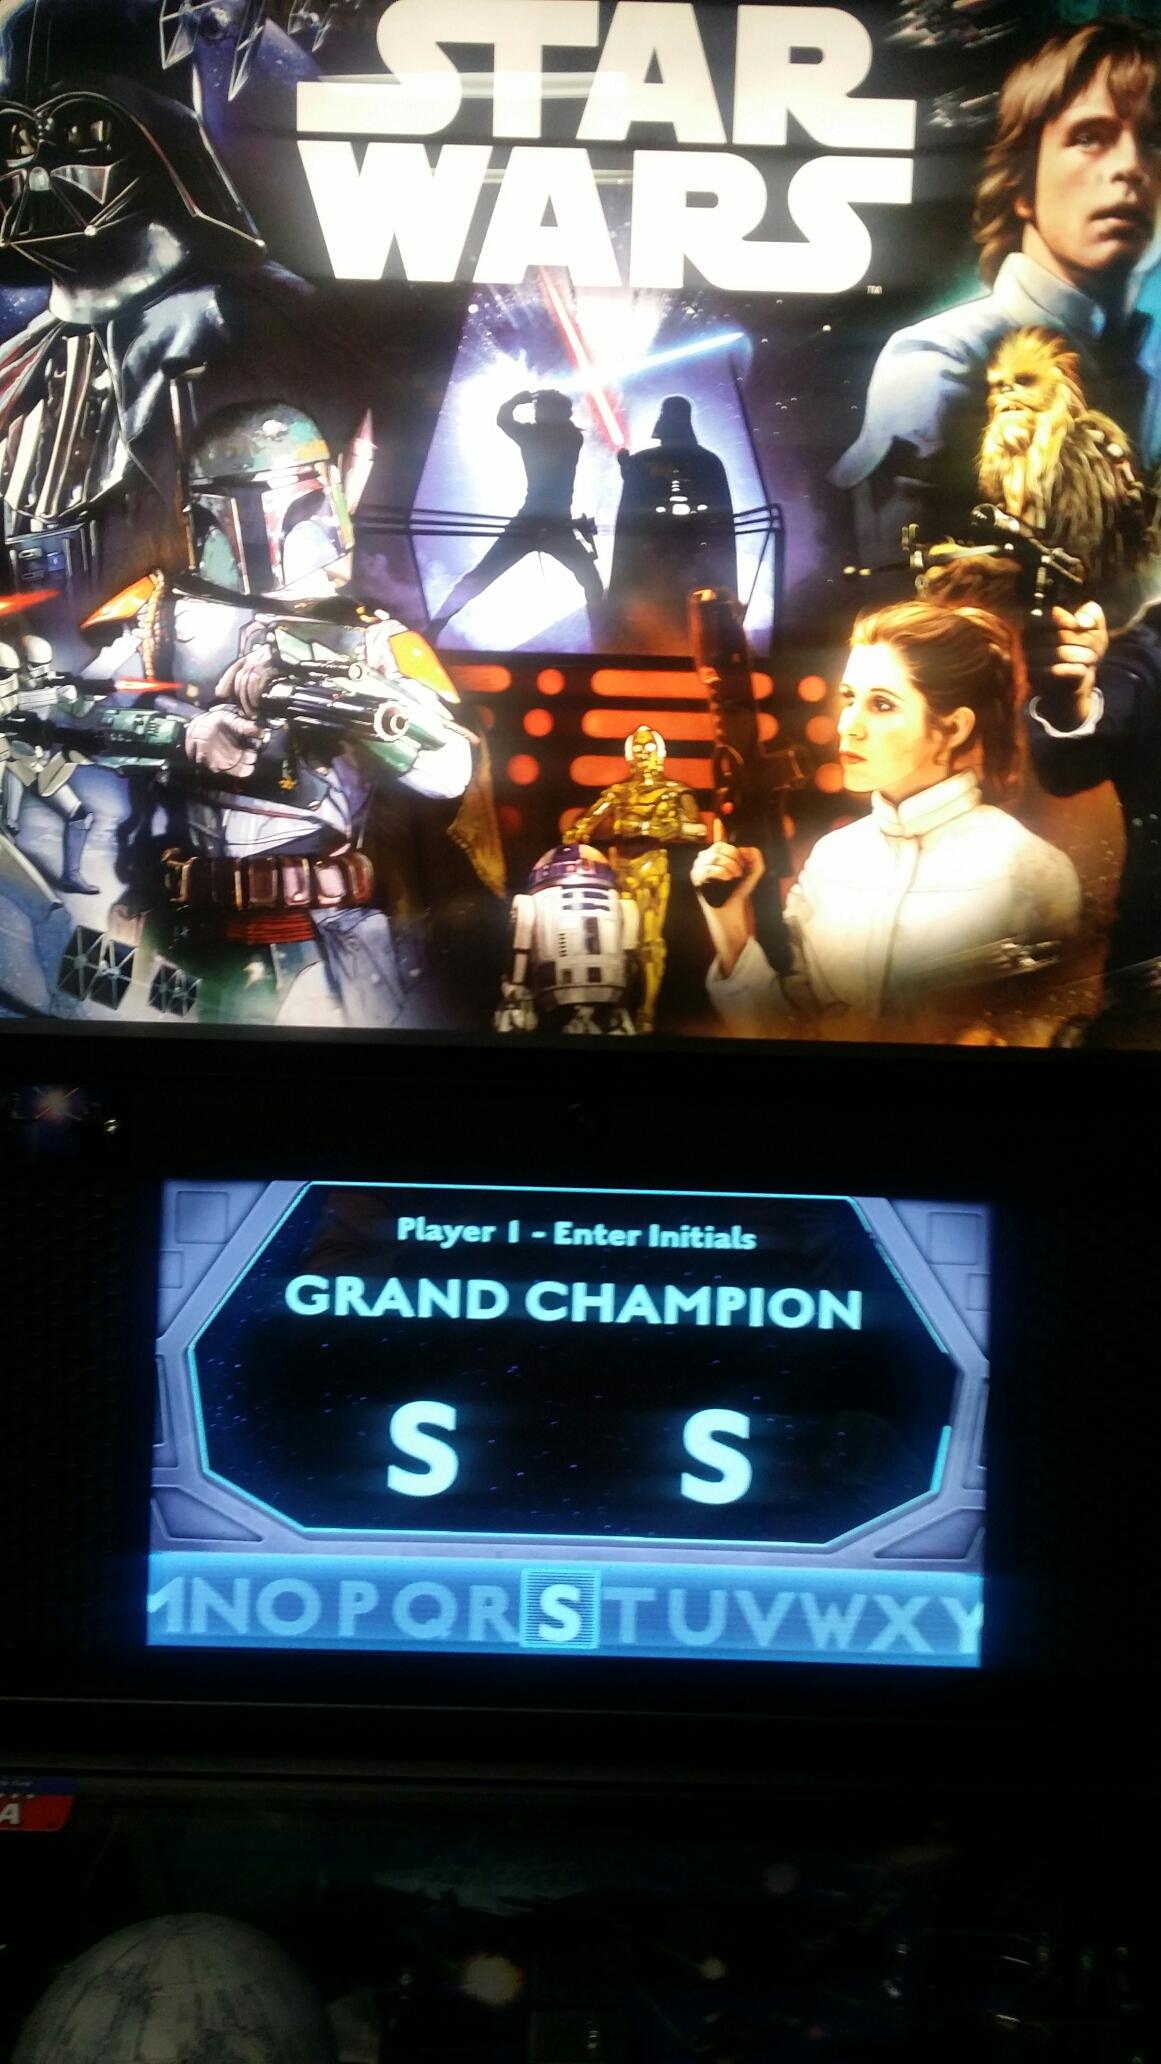 Star Wars: Stern 2017 - Tatooine Champion 184,250,000 points